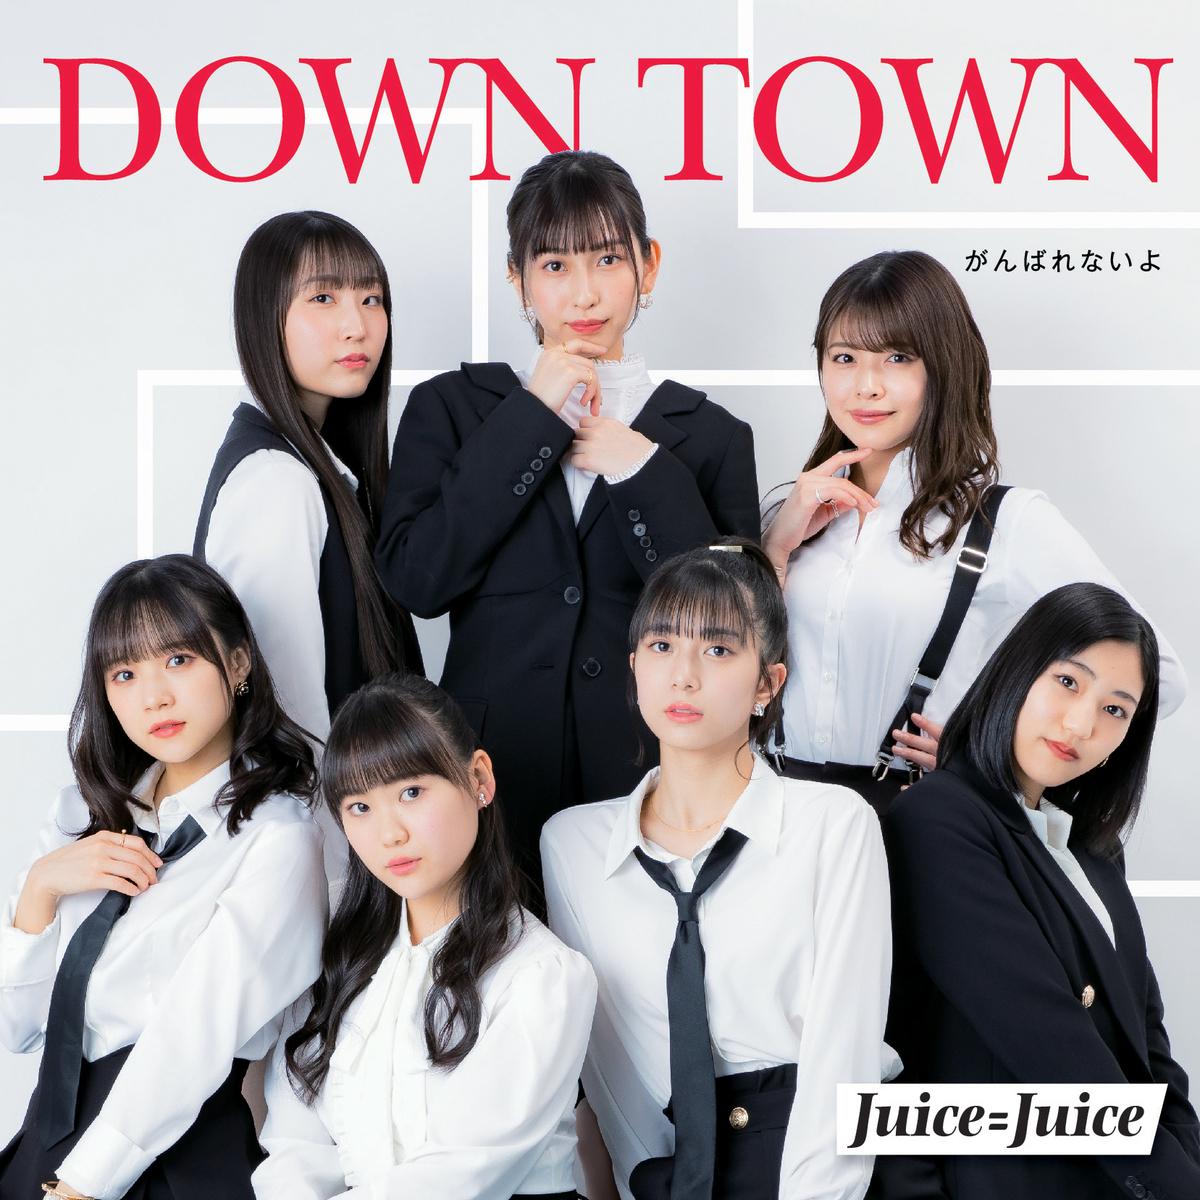 Juice=Juice 14thシングル『DOWN TOWN/がんばれないよ』